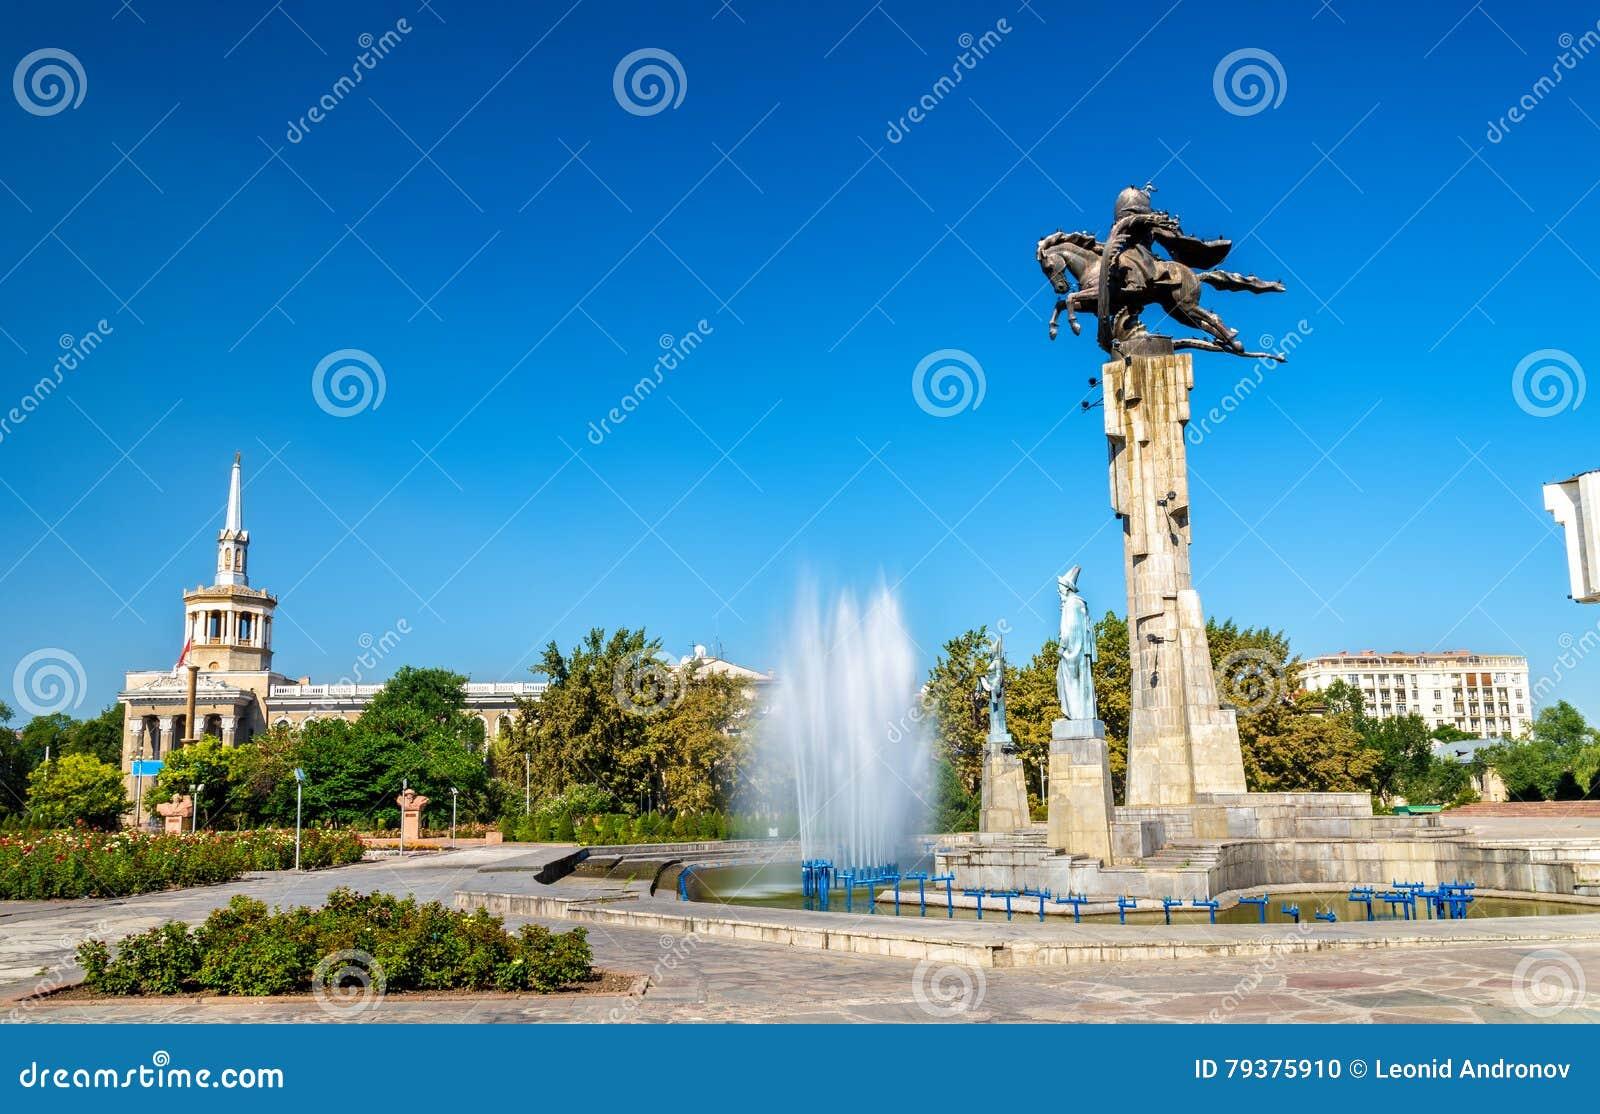 Manas equestrian monument in Bishkek, Kyrgyz Republic